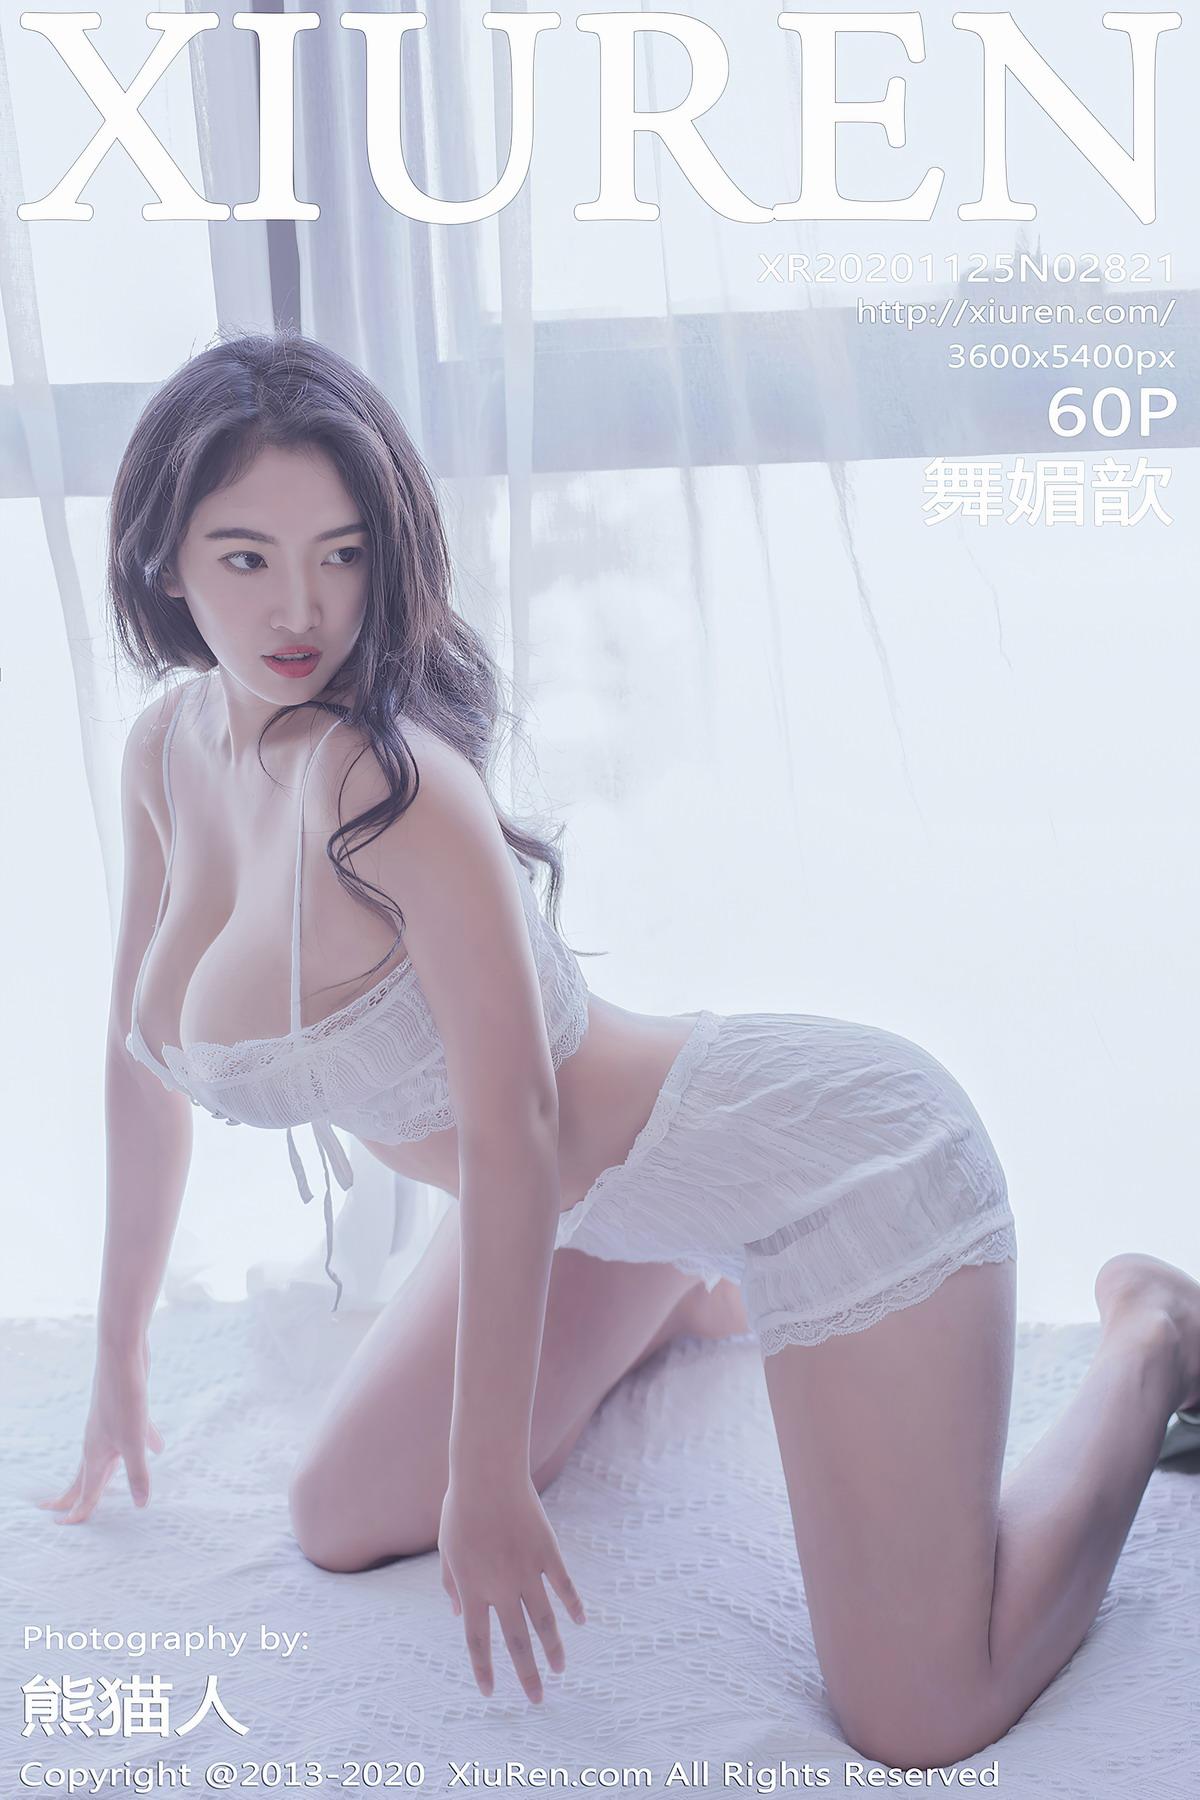 [Xiuren秀人网]2020.11.25 NO.2821 舞媚歆[/550MB]